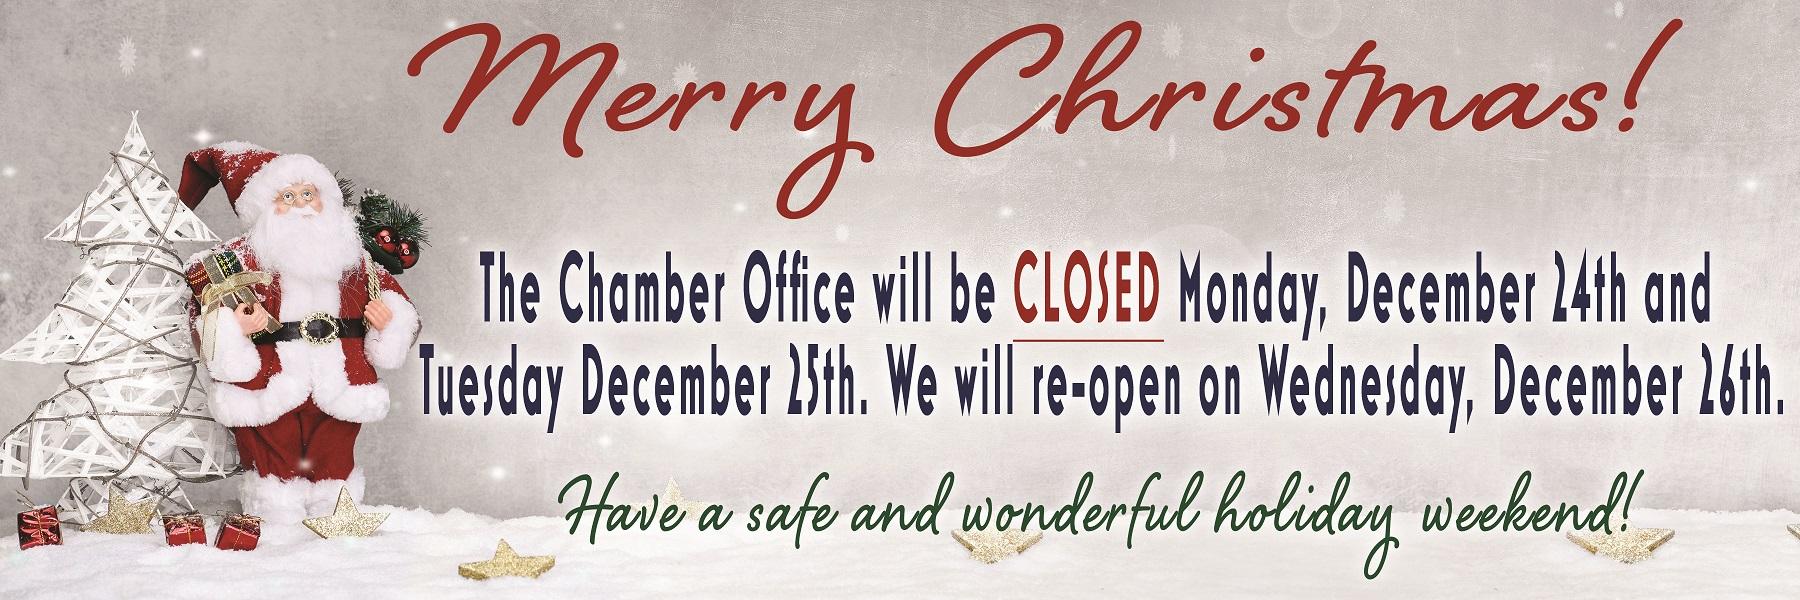 2018-Christmas-Chamber-Closed-Banner-Size.jpg